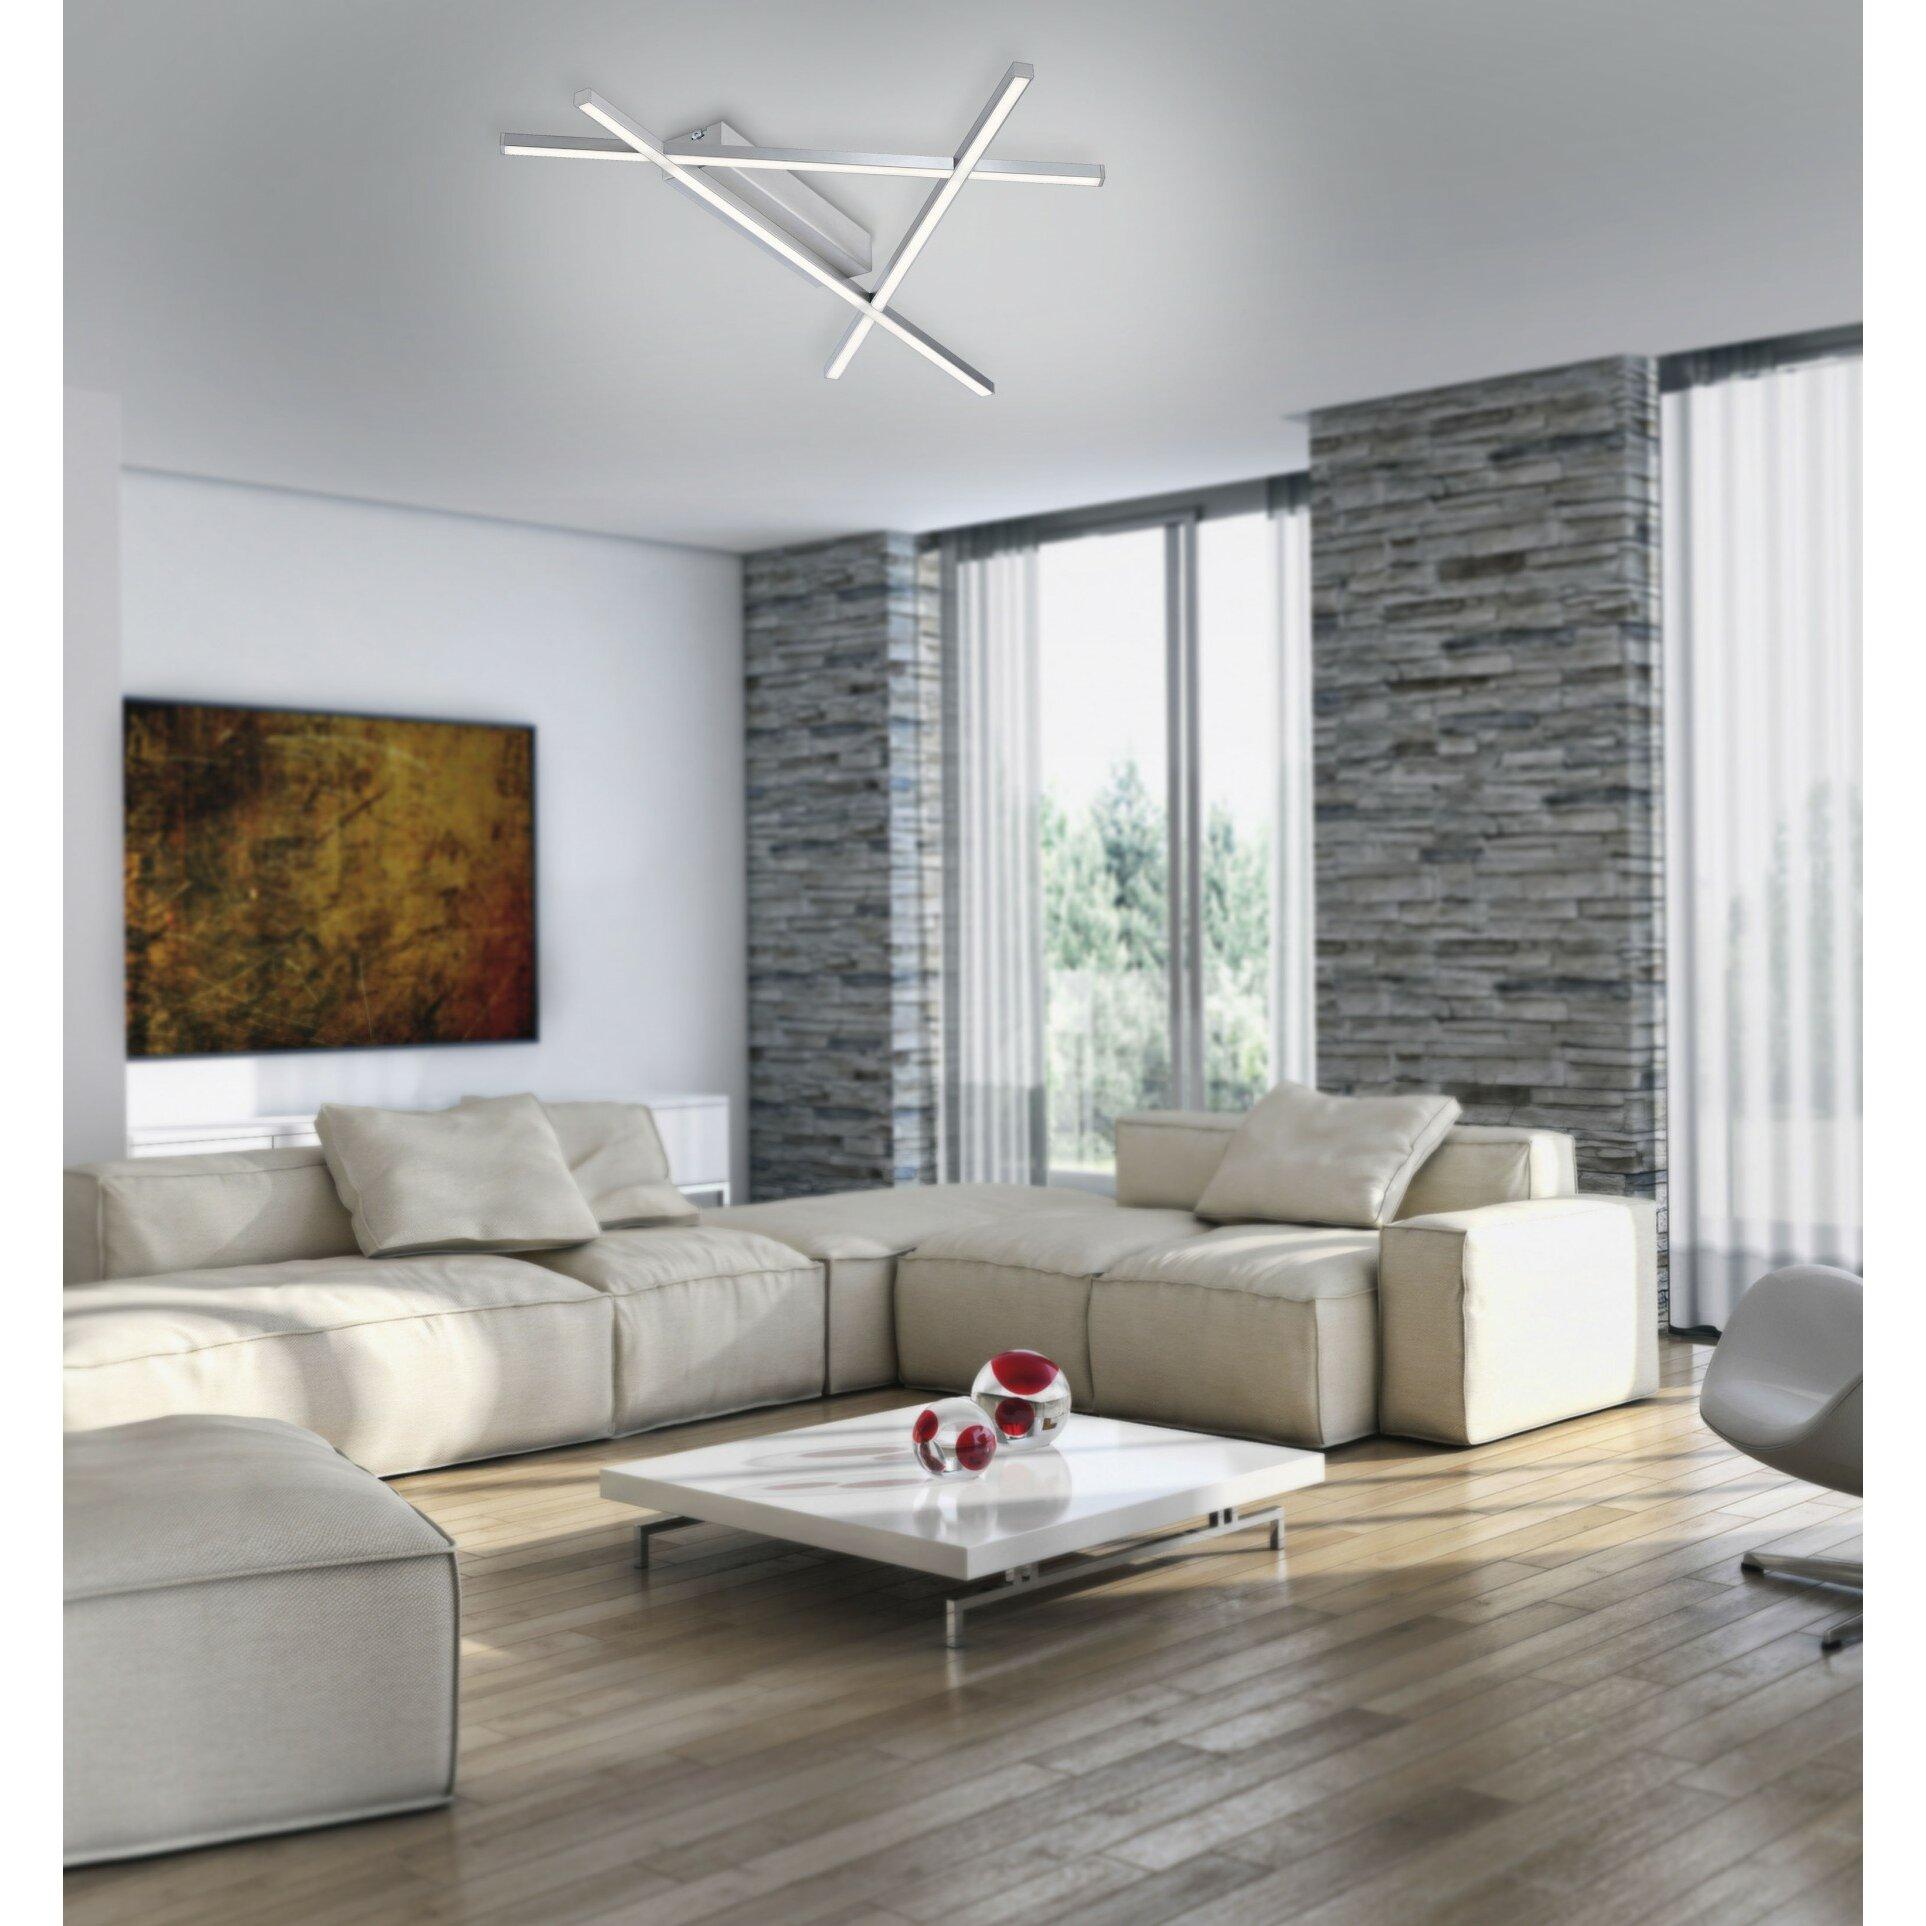 paul neuhaus deckenleuchte 3 flammig stick 2 bewertungen. Black Bedroom Furniture Sets. Home Design Ideas